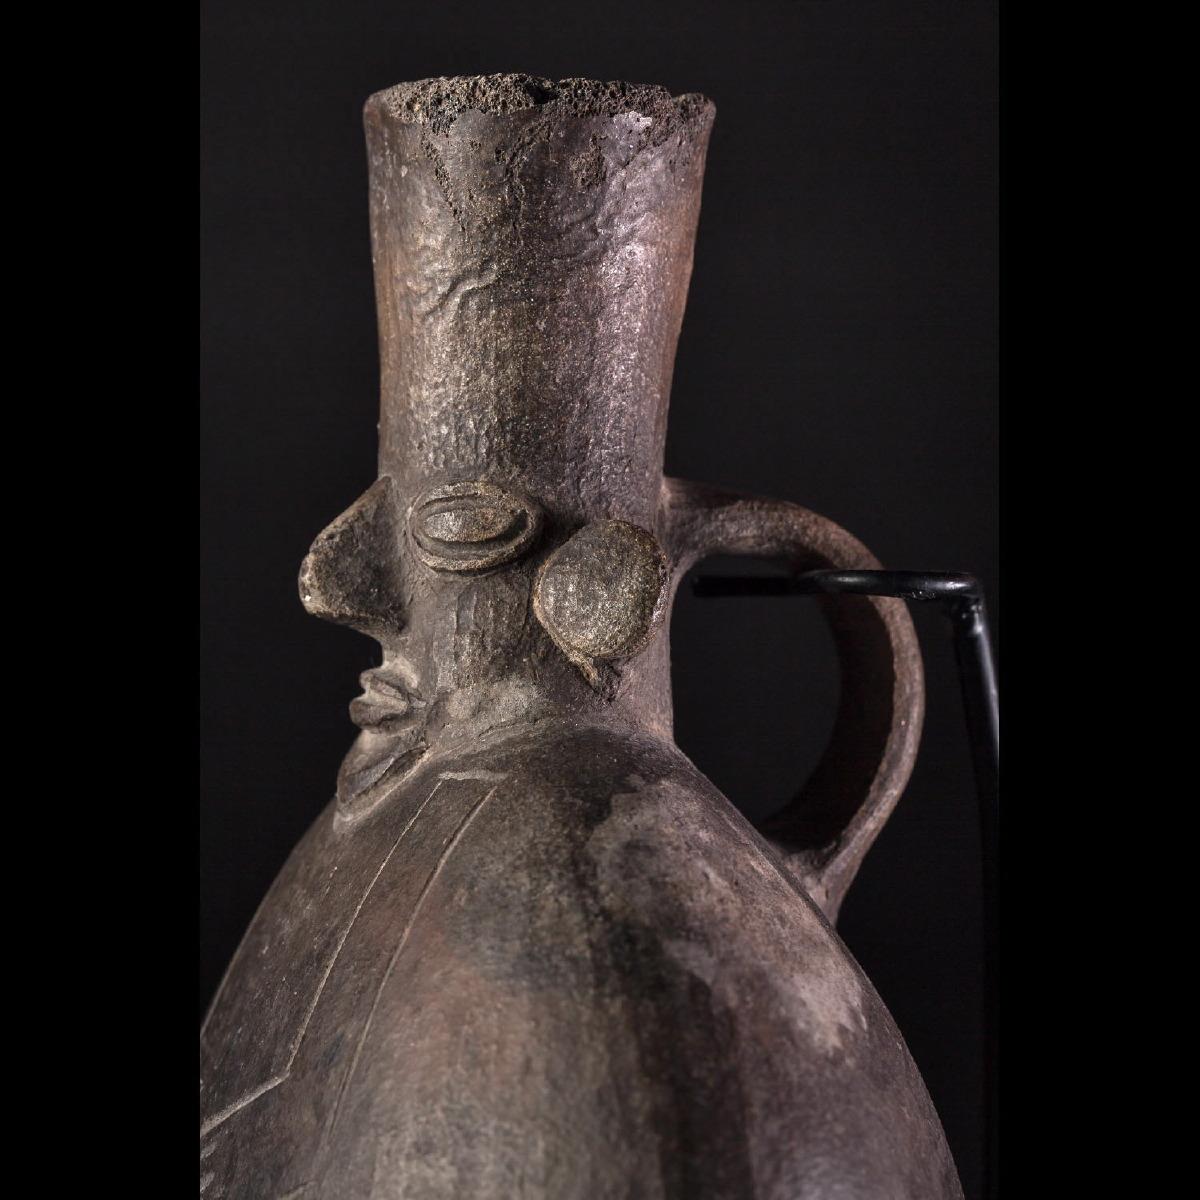 Photo of mochica-moche-ceramics-terracotta-vase-peru-archeology